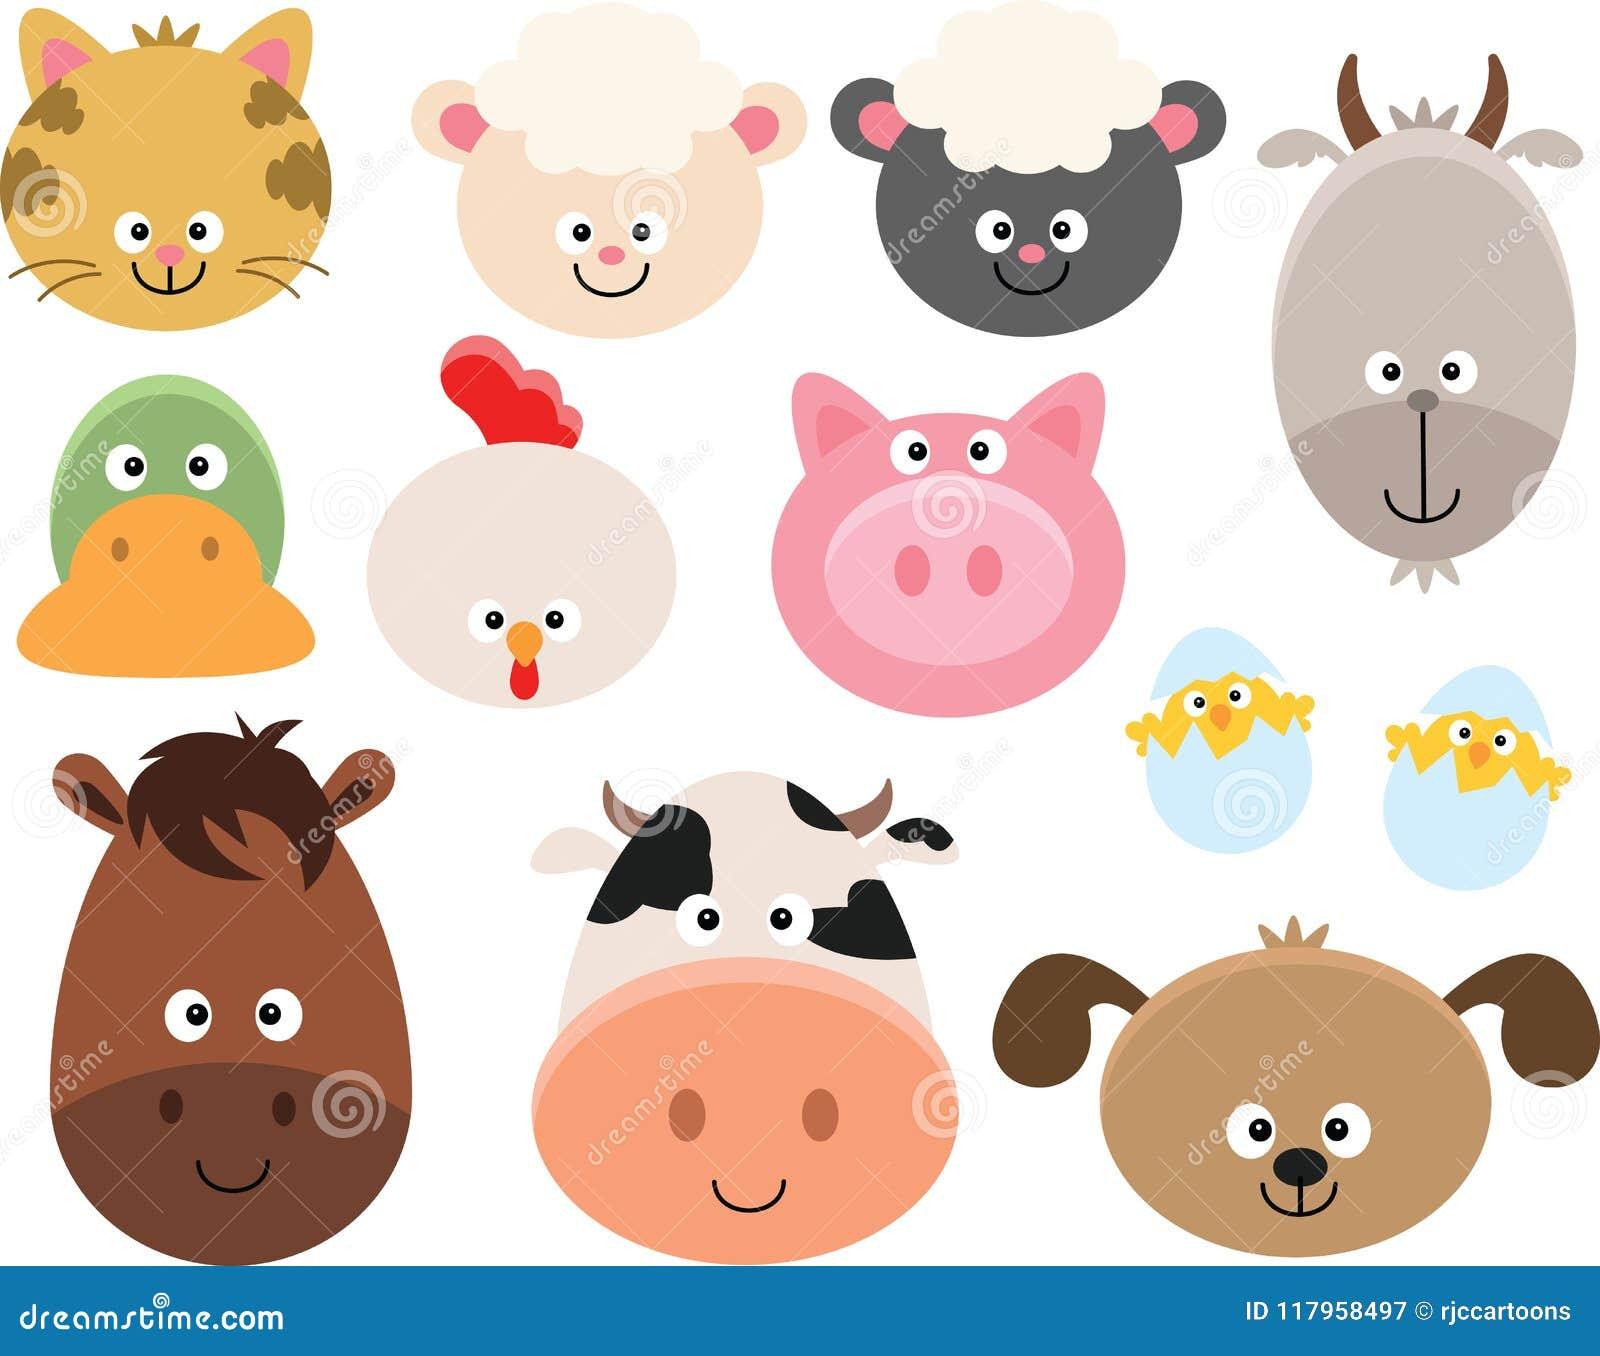 Farm Animal Faces Clipart Set Stock Vector Illustration of cute